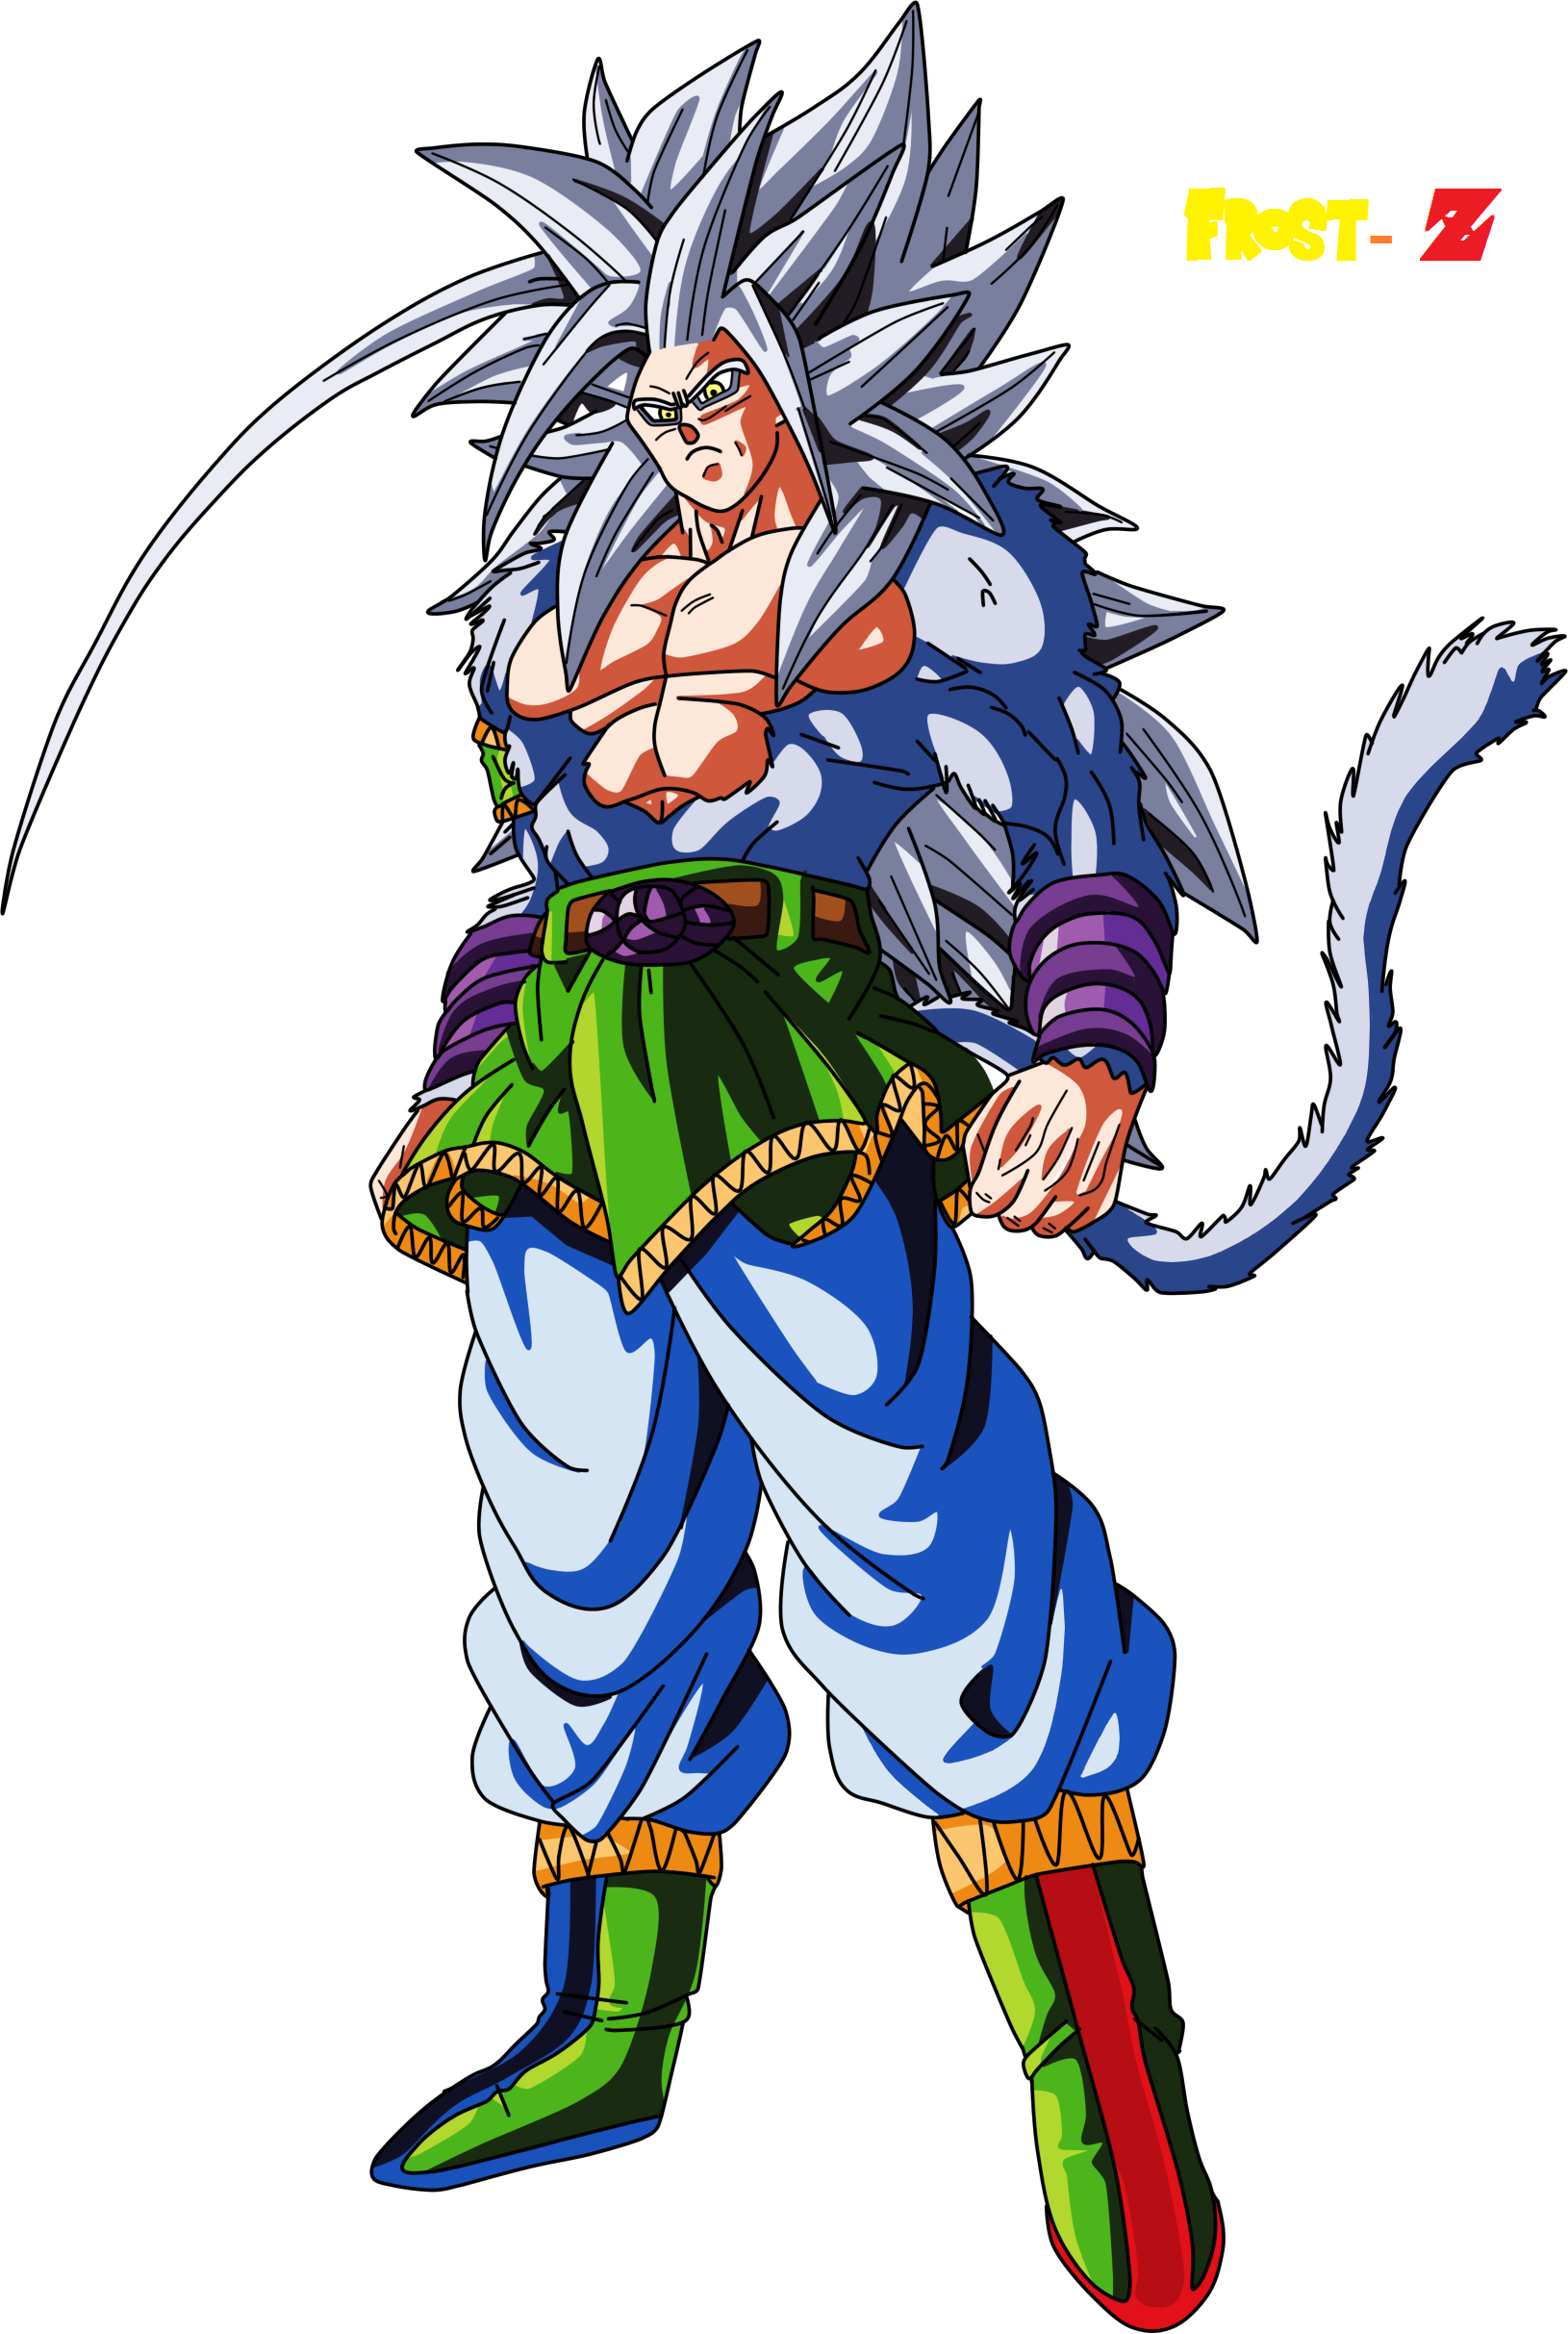 Super Saiyan 5 Broly Vs Goku | www.imgkid.com - The Image ...